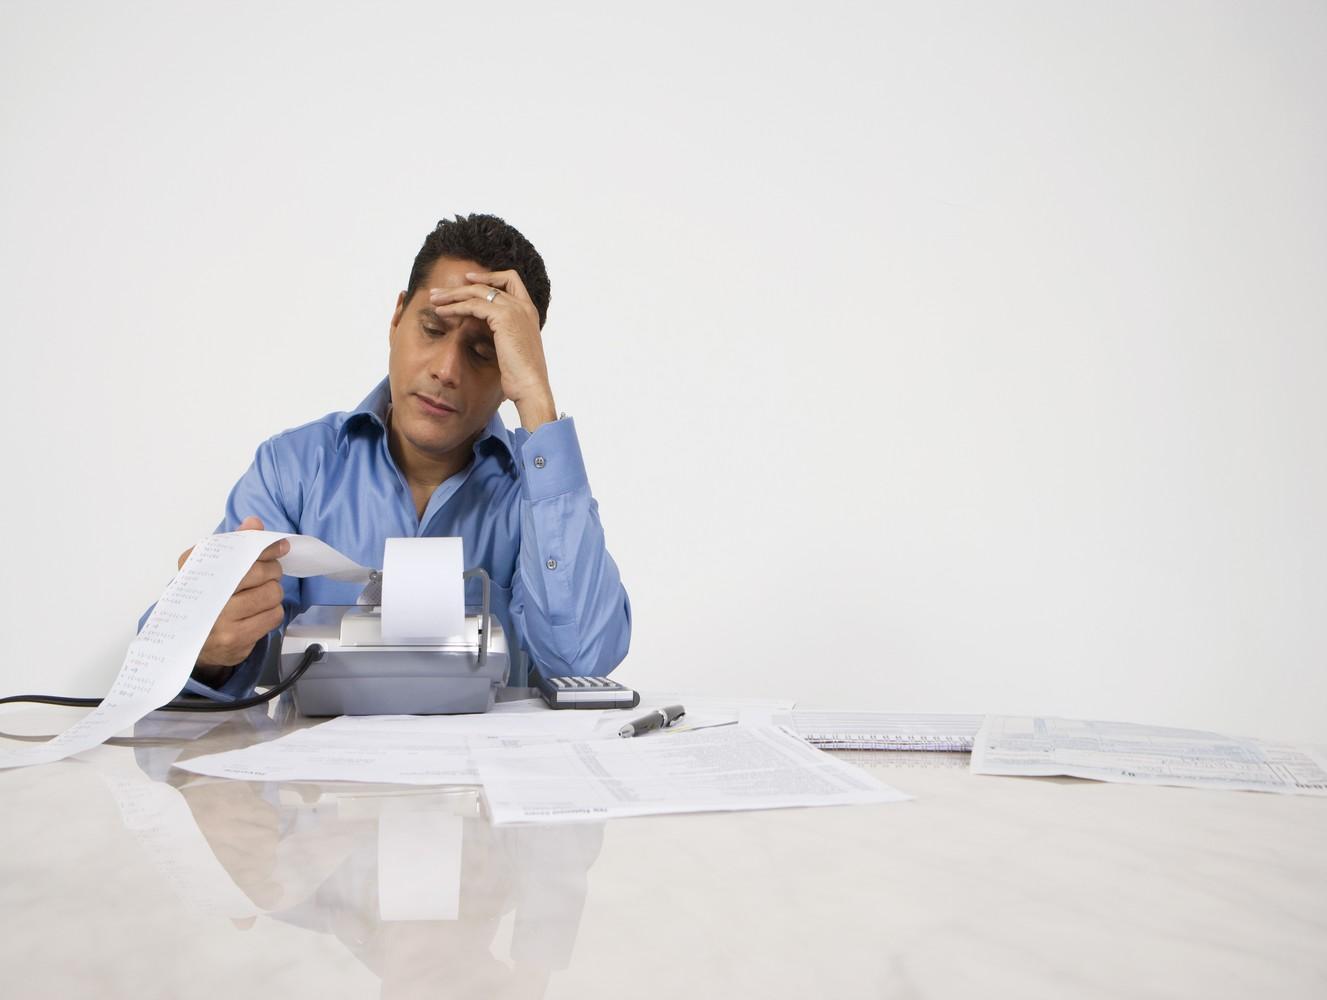 contester frais bancaires